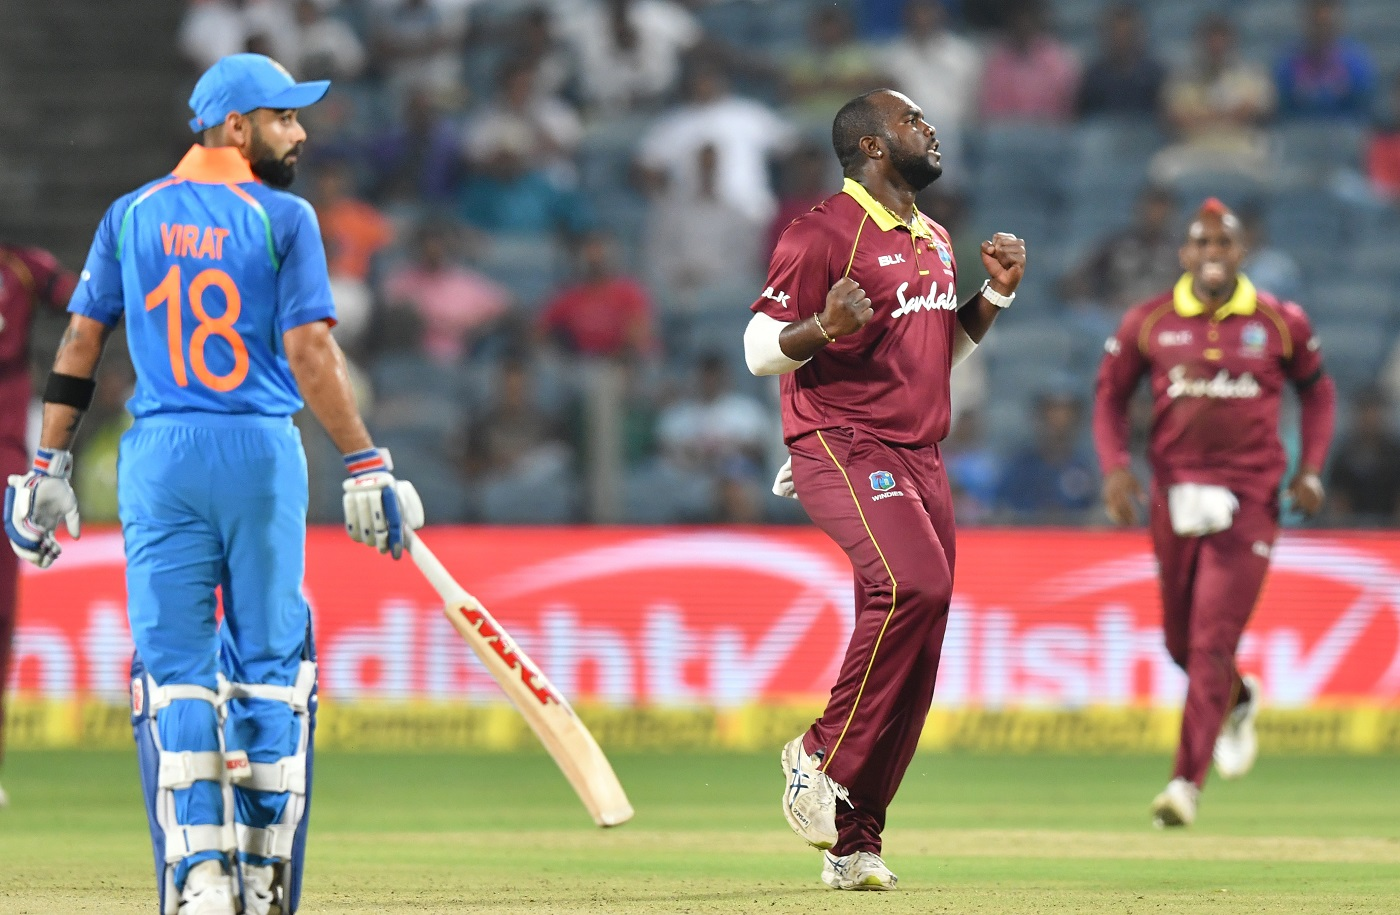 India vs Windies 2018, Third ODI - Twitter Reacts As Virat Kohli's Ton Goes In Vain